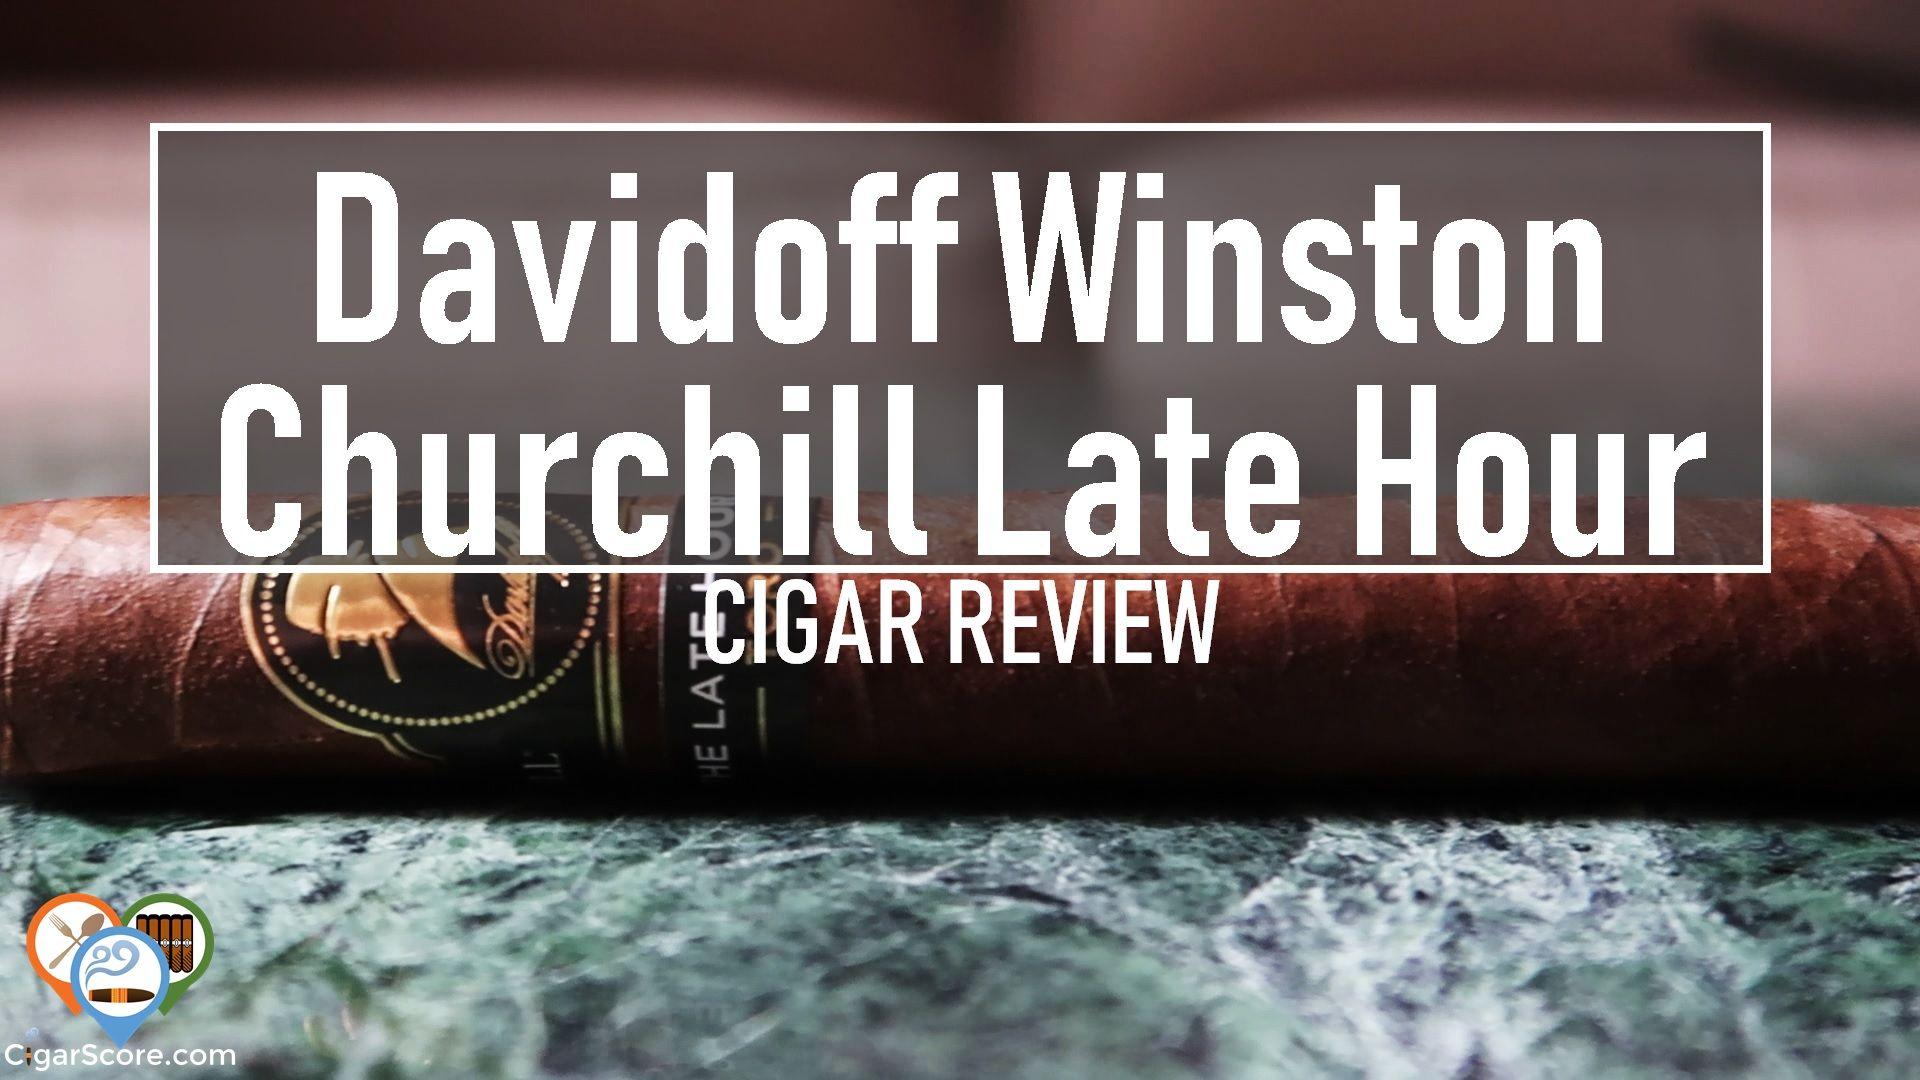 cigar review - Davidoff Winston Churchill Late Hour Toro